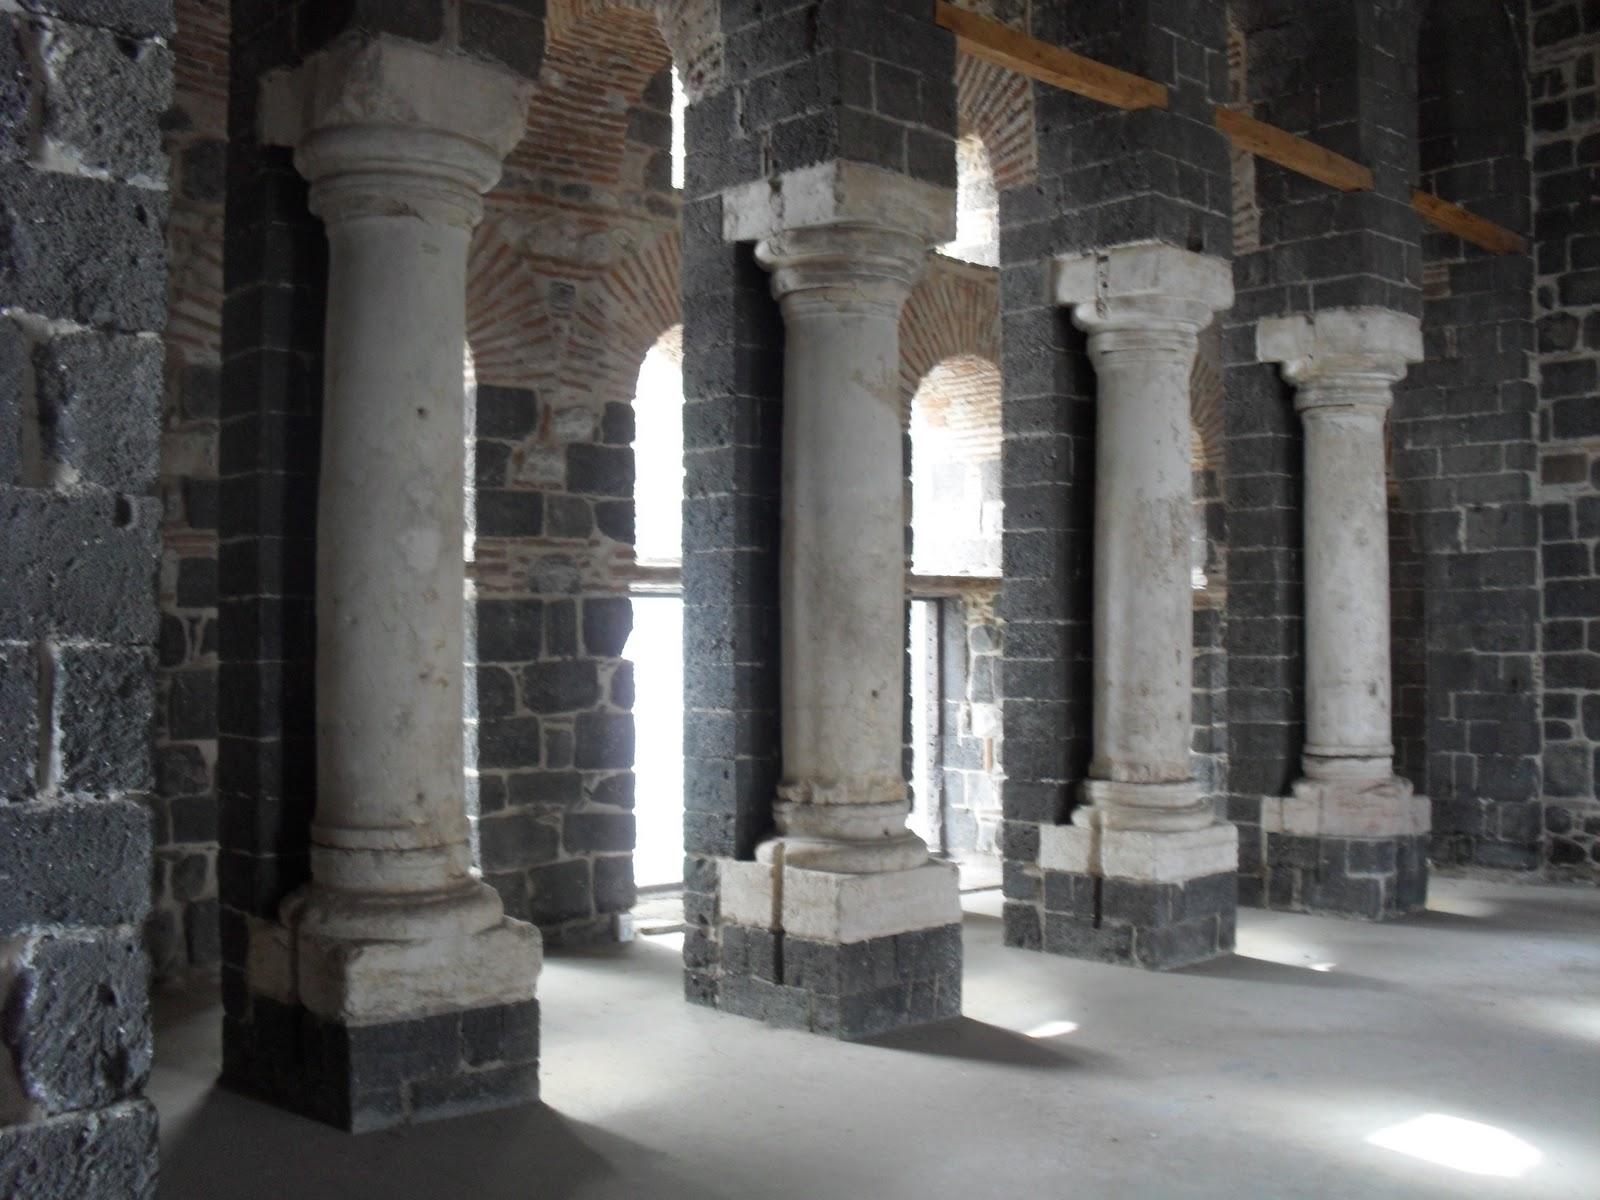 st george kilisesi diyarbakir